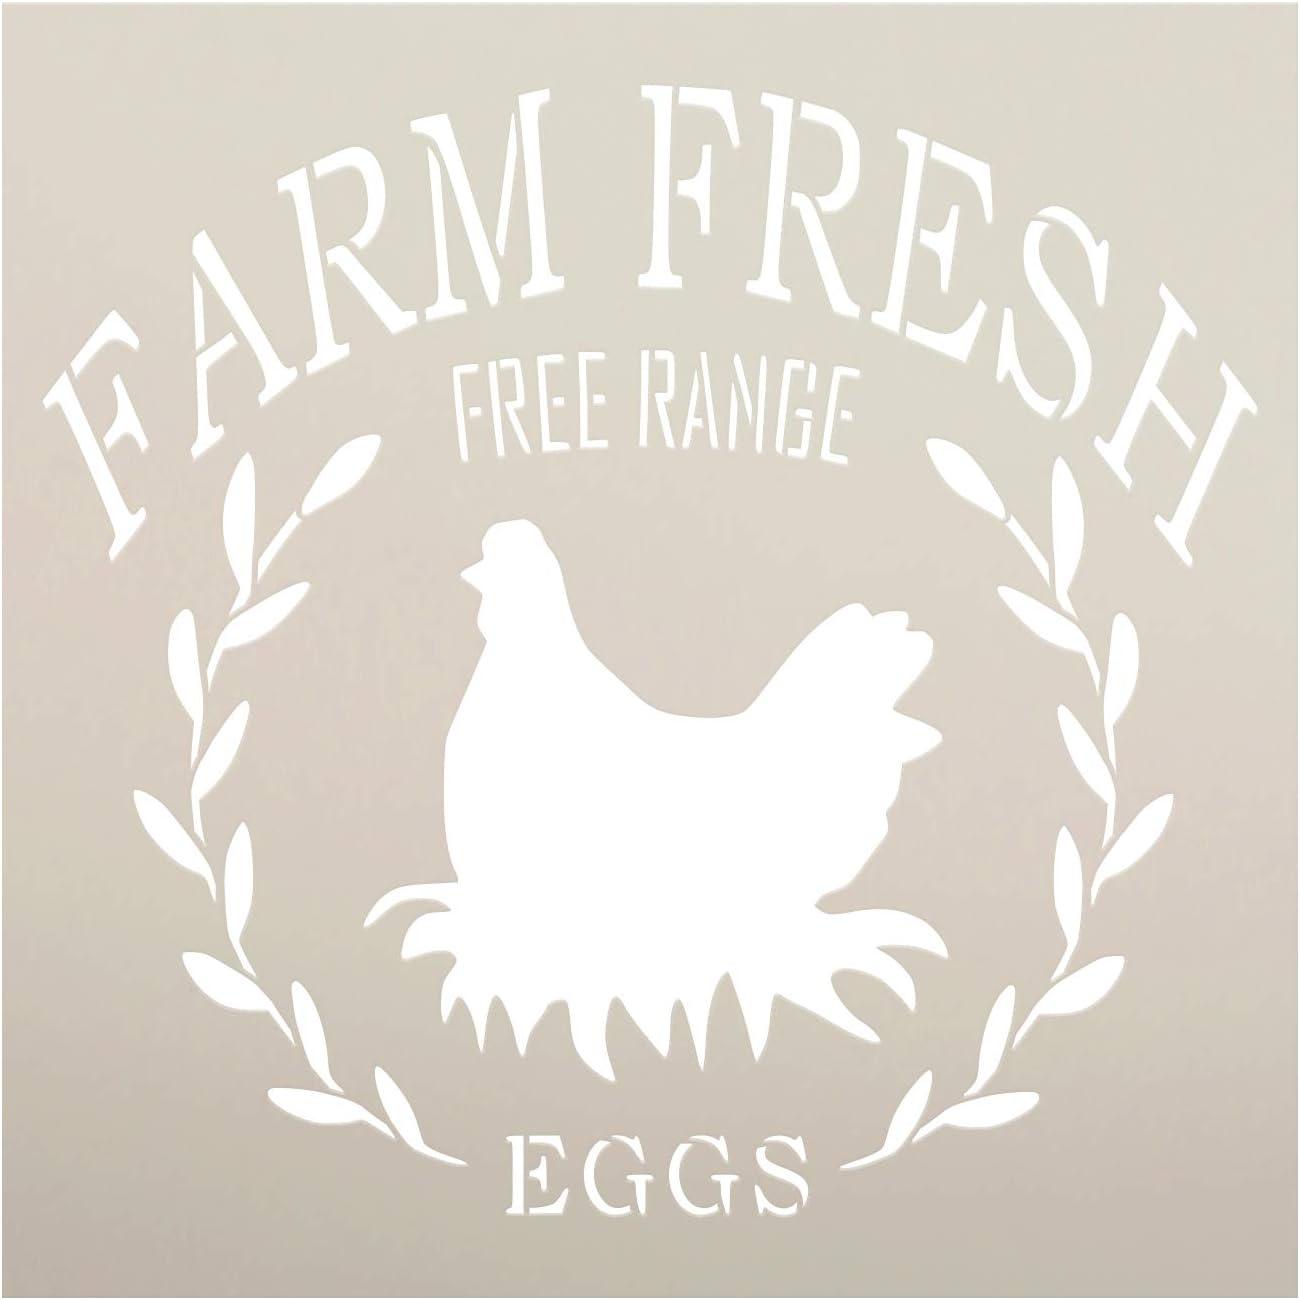 Amazon Com Farm Fresh Free Range Eggs Stencil By Studior12 Diy Chicken Laurel Wreath Home Decor Craft Paint Wood Sign Reusable Mylar Template Rustic Kitchen Barn Select